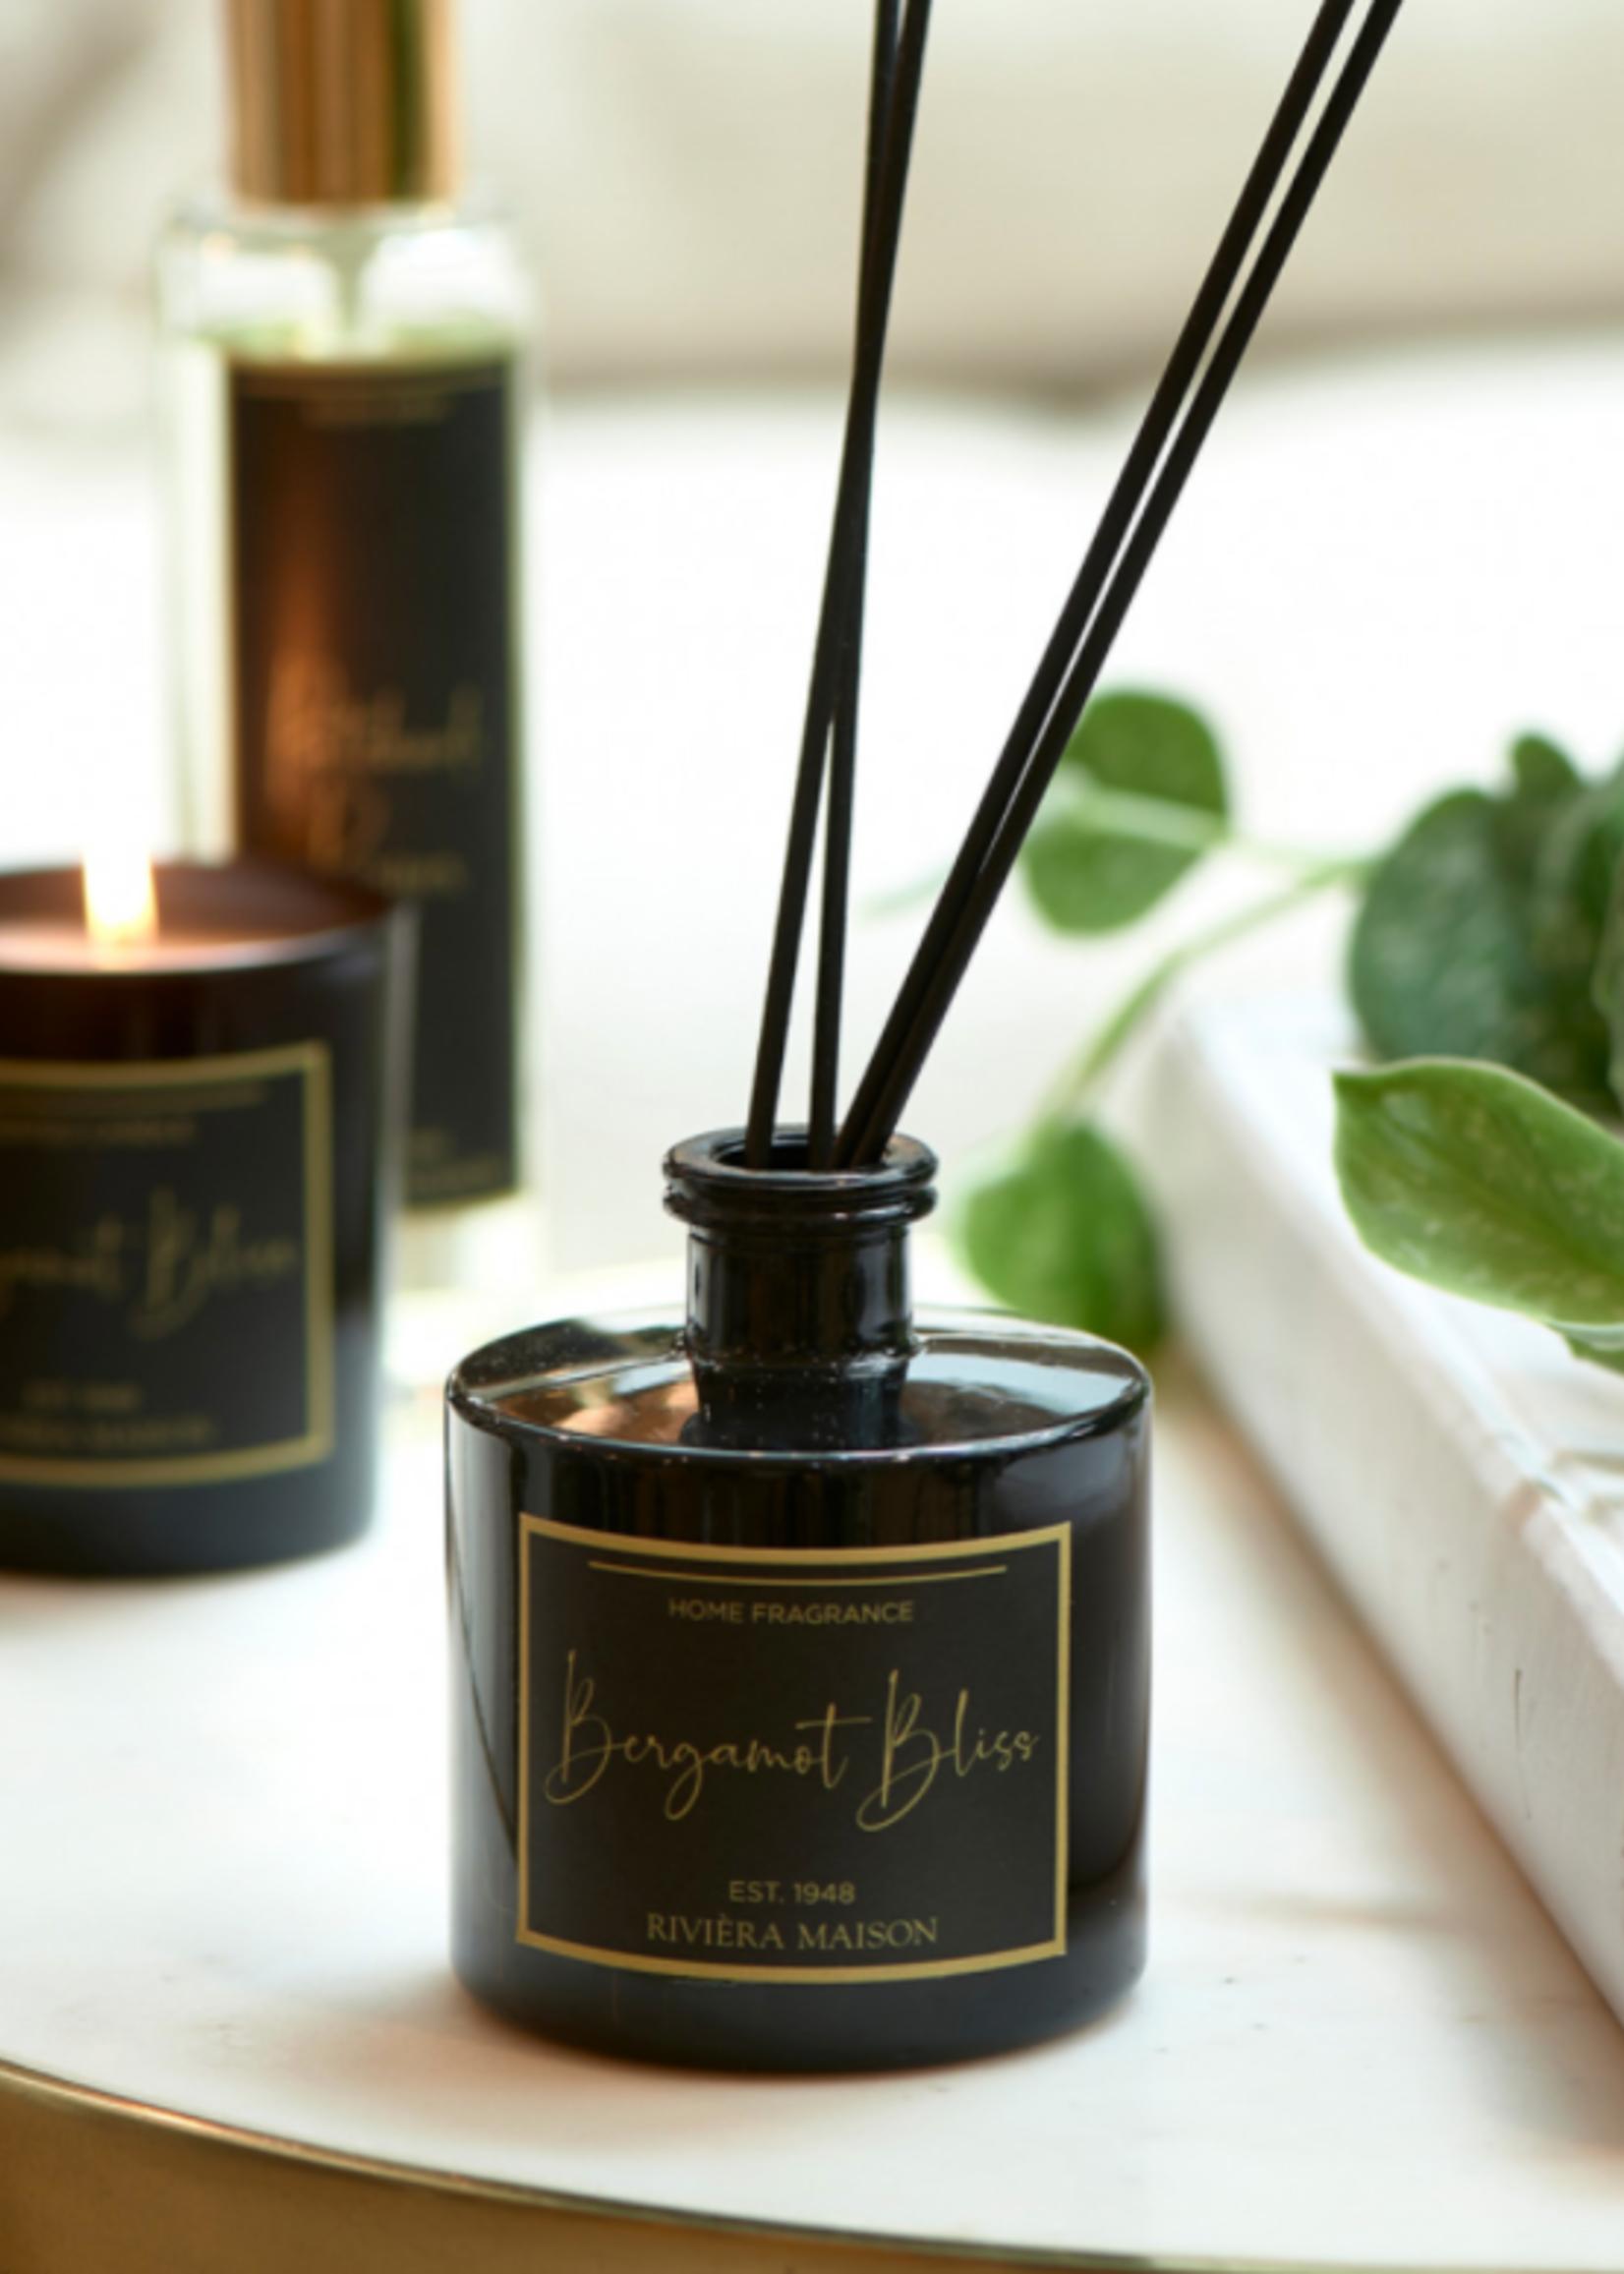 Riviera Maison RM Bergamot Bliss Fragrance Sticks